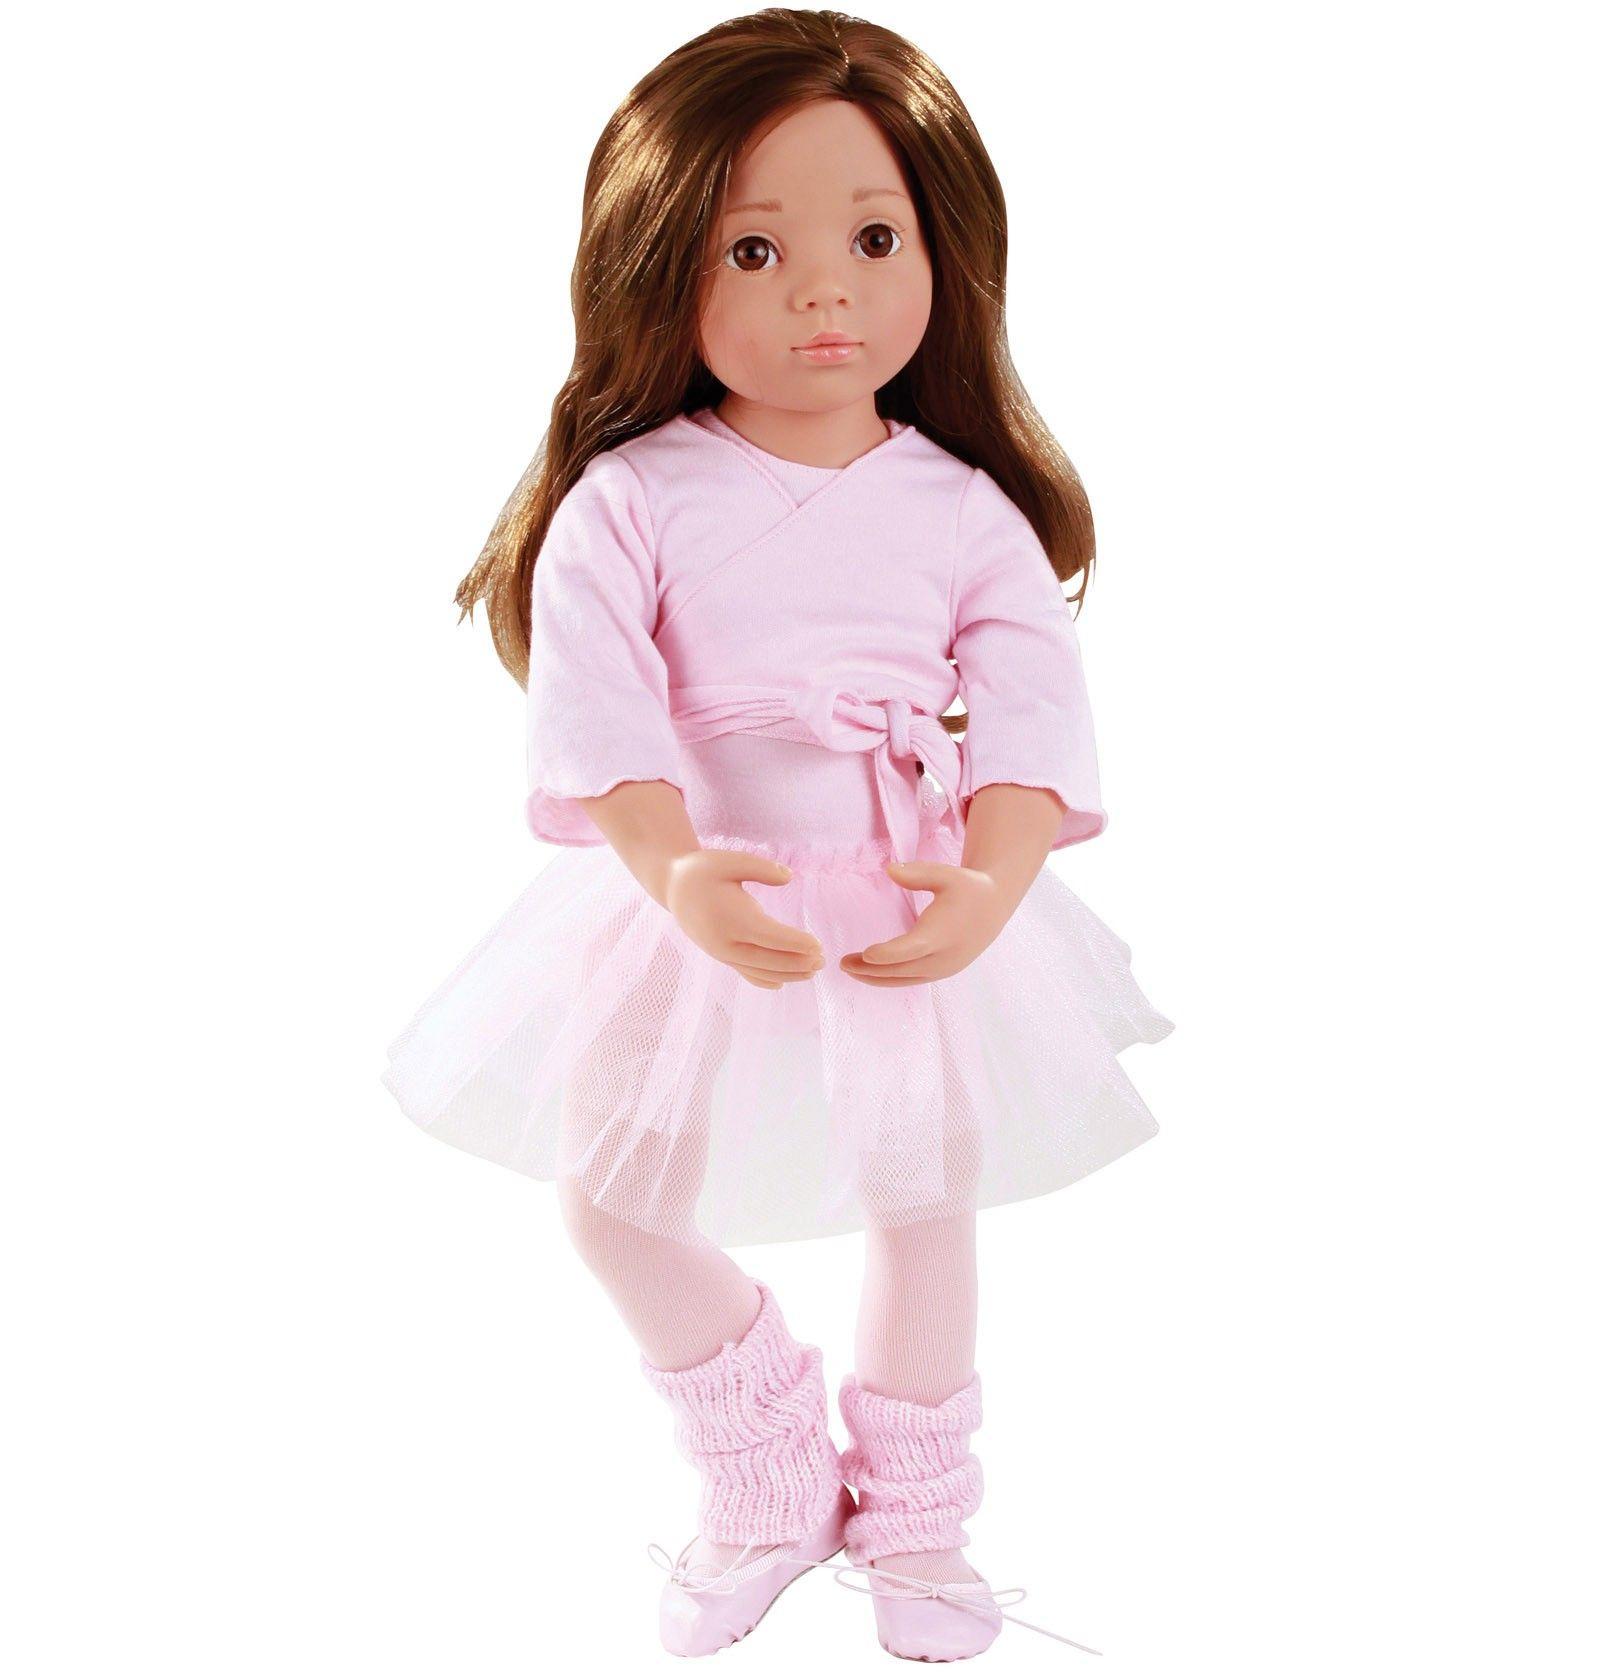 Slippers+Headband 18 in Doll Clothes Fits American Girl Daisy Ballerina Dress